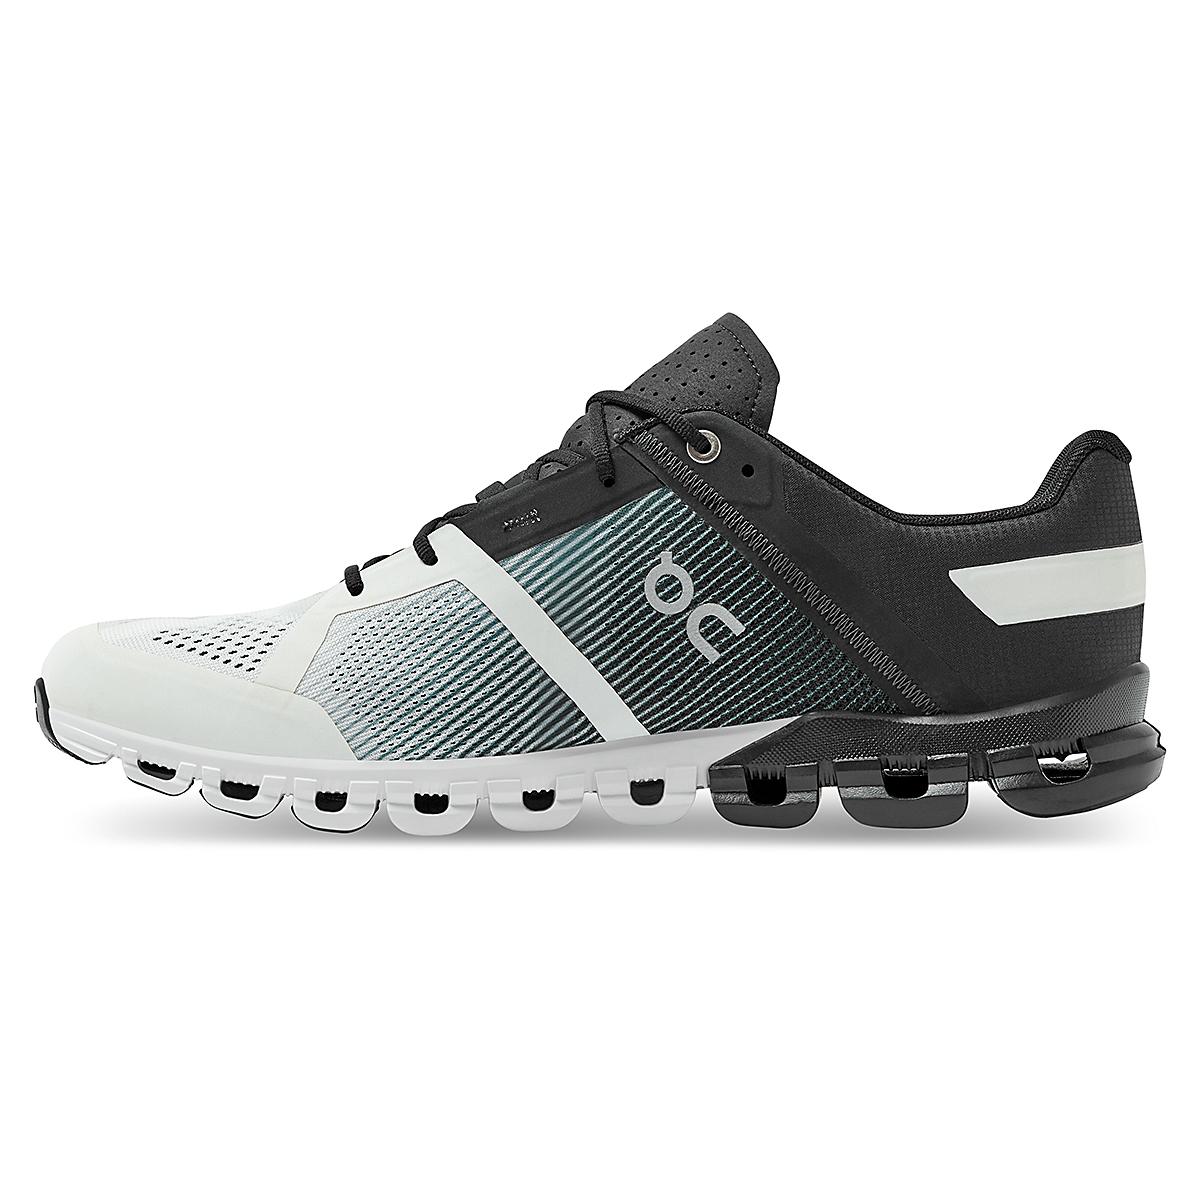 Men's On Cloudflow 2.0 Running Shoe - Color: Black/White - Size: 9.5 - Width: Regular, Black/White, large, image 2